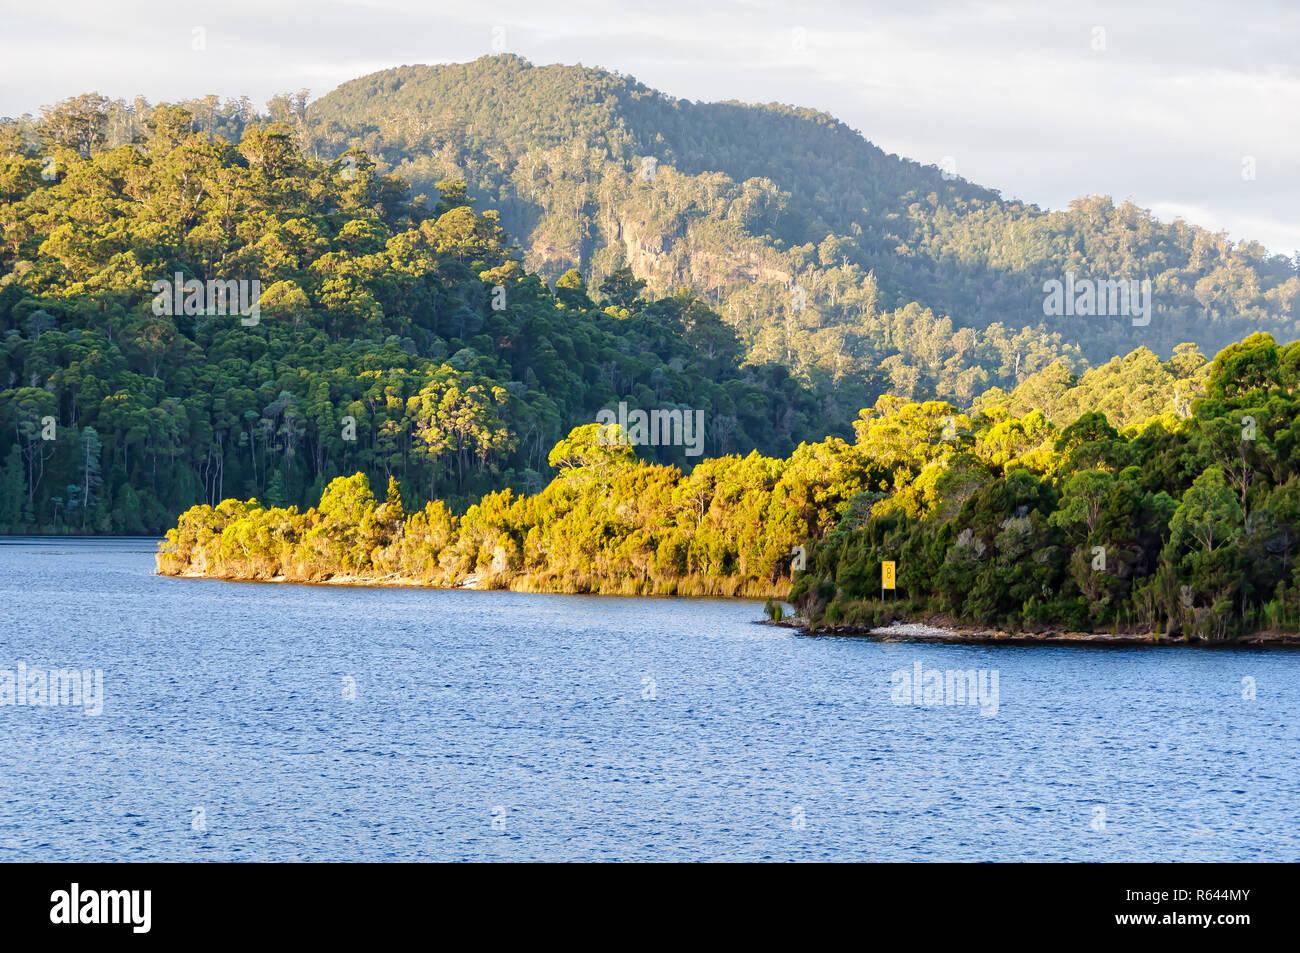 Lago Rosebery en la región de la costa oeste de Tasmania Foto de stock